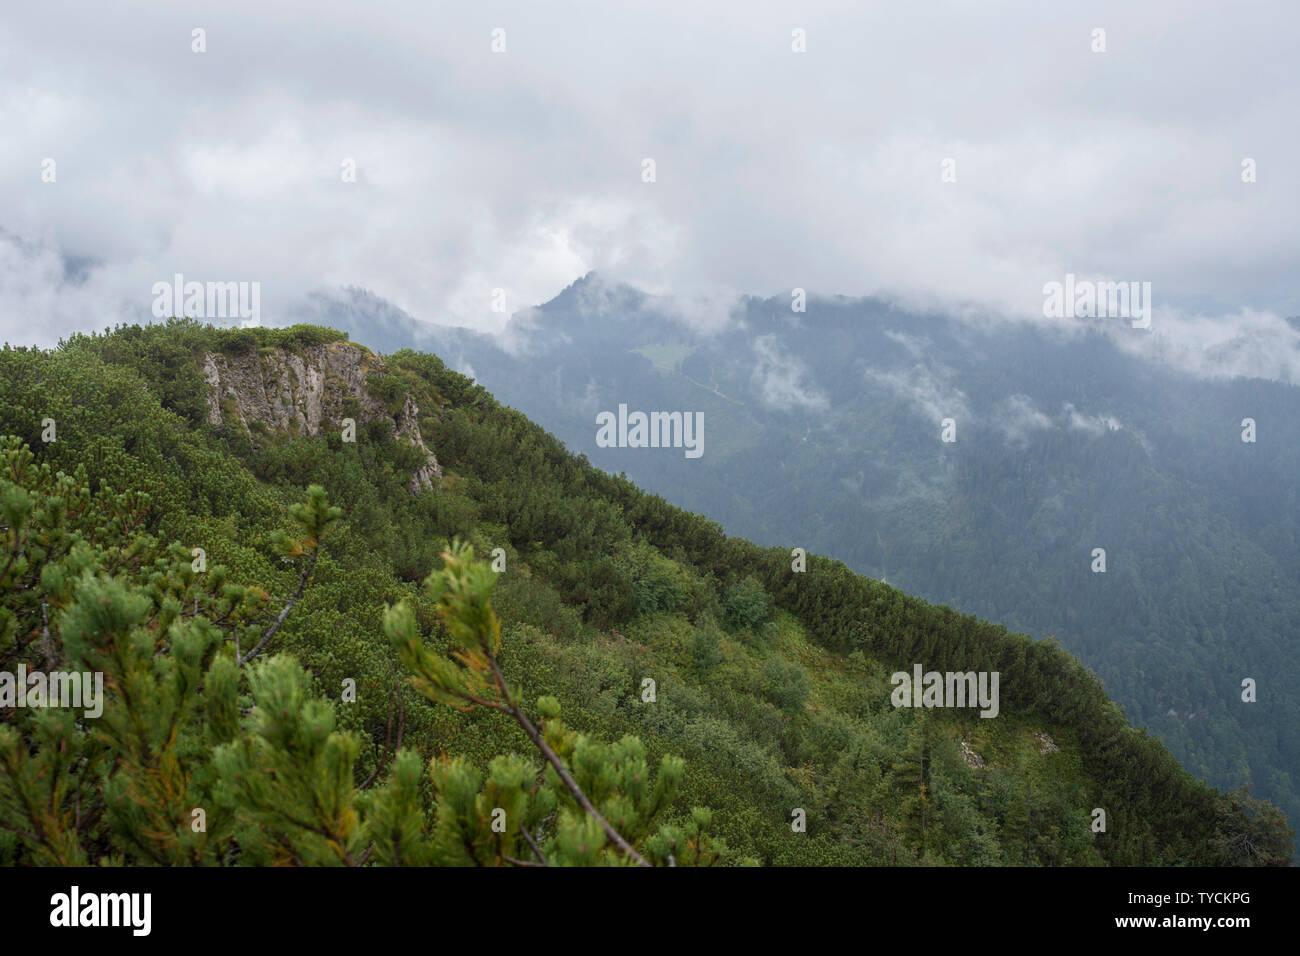 Hochfelln mountain, view from summit plateau, Hochfelln mountain railway, Hochfelln, Chiemgau, Upper Bavaria, Bavaria, Bavarian Alps, Germany - Stock Image